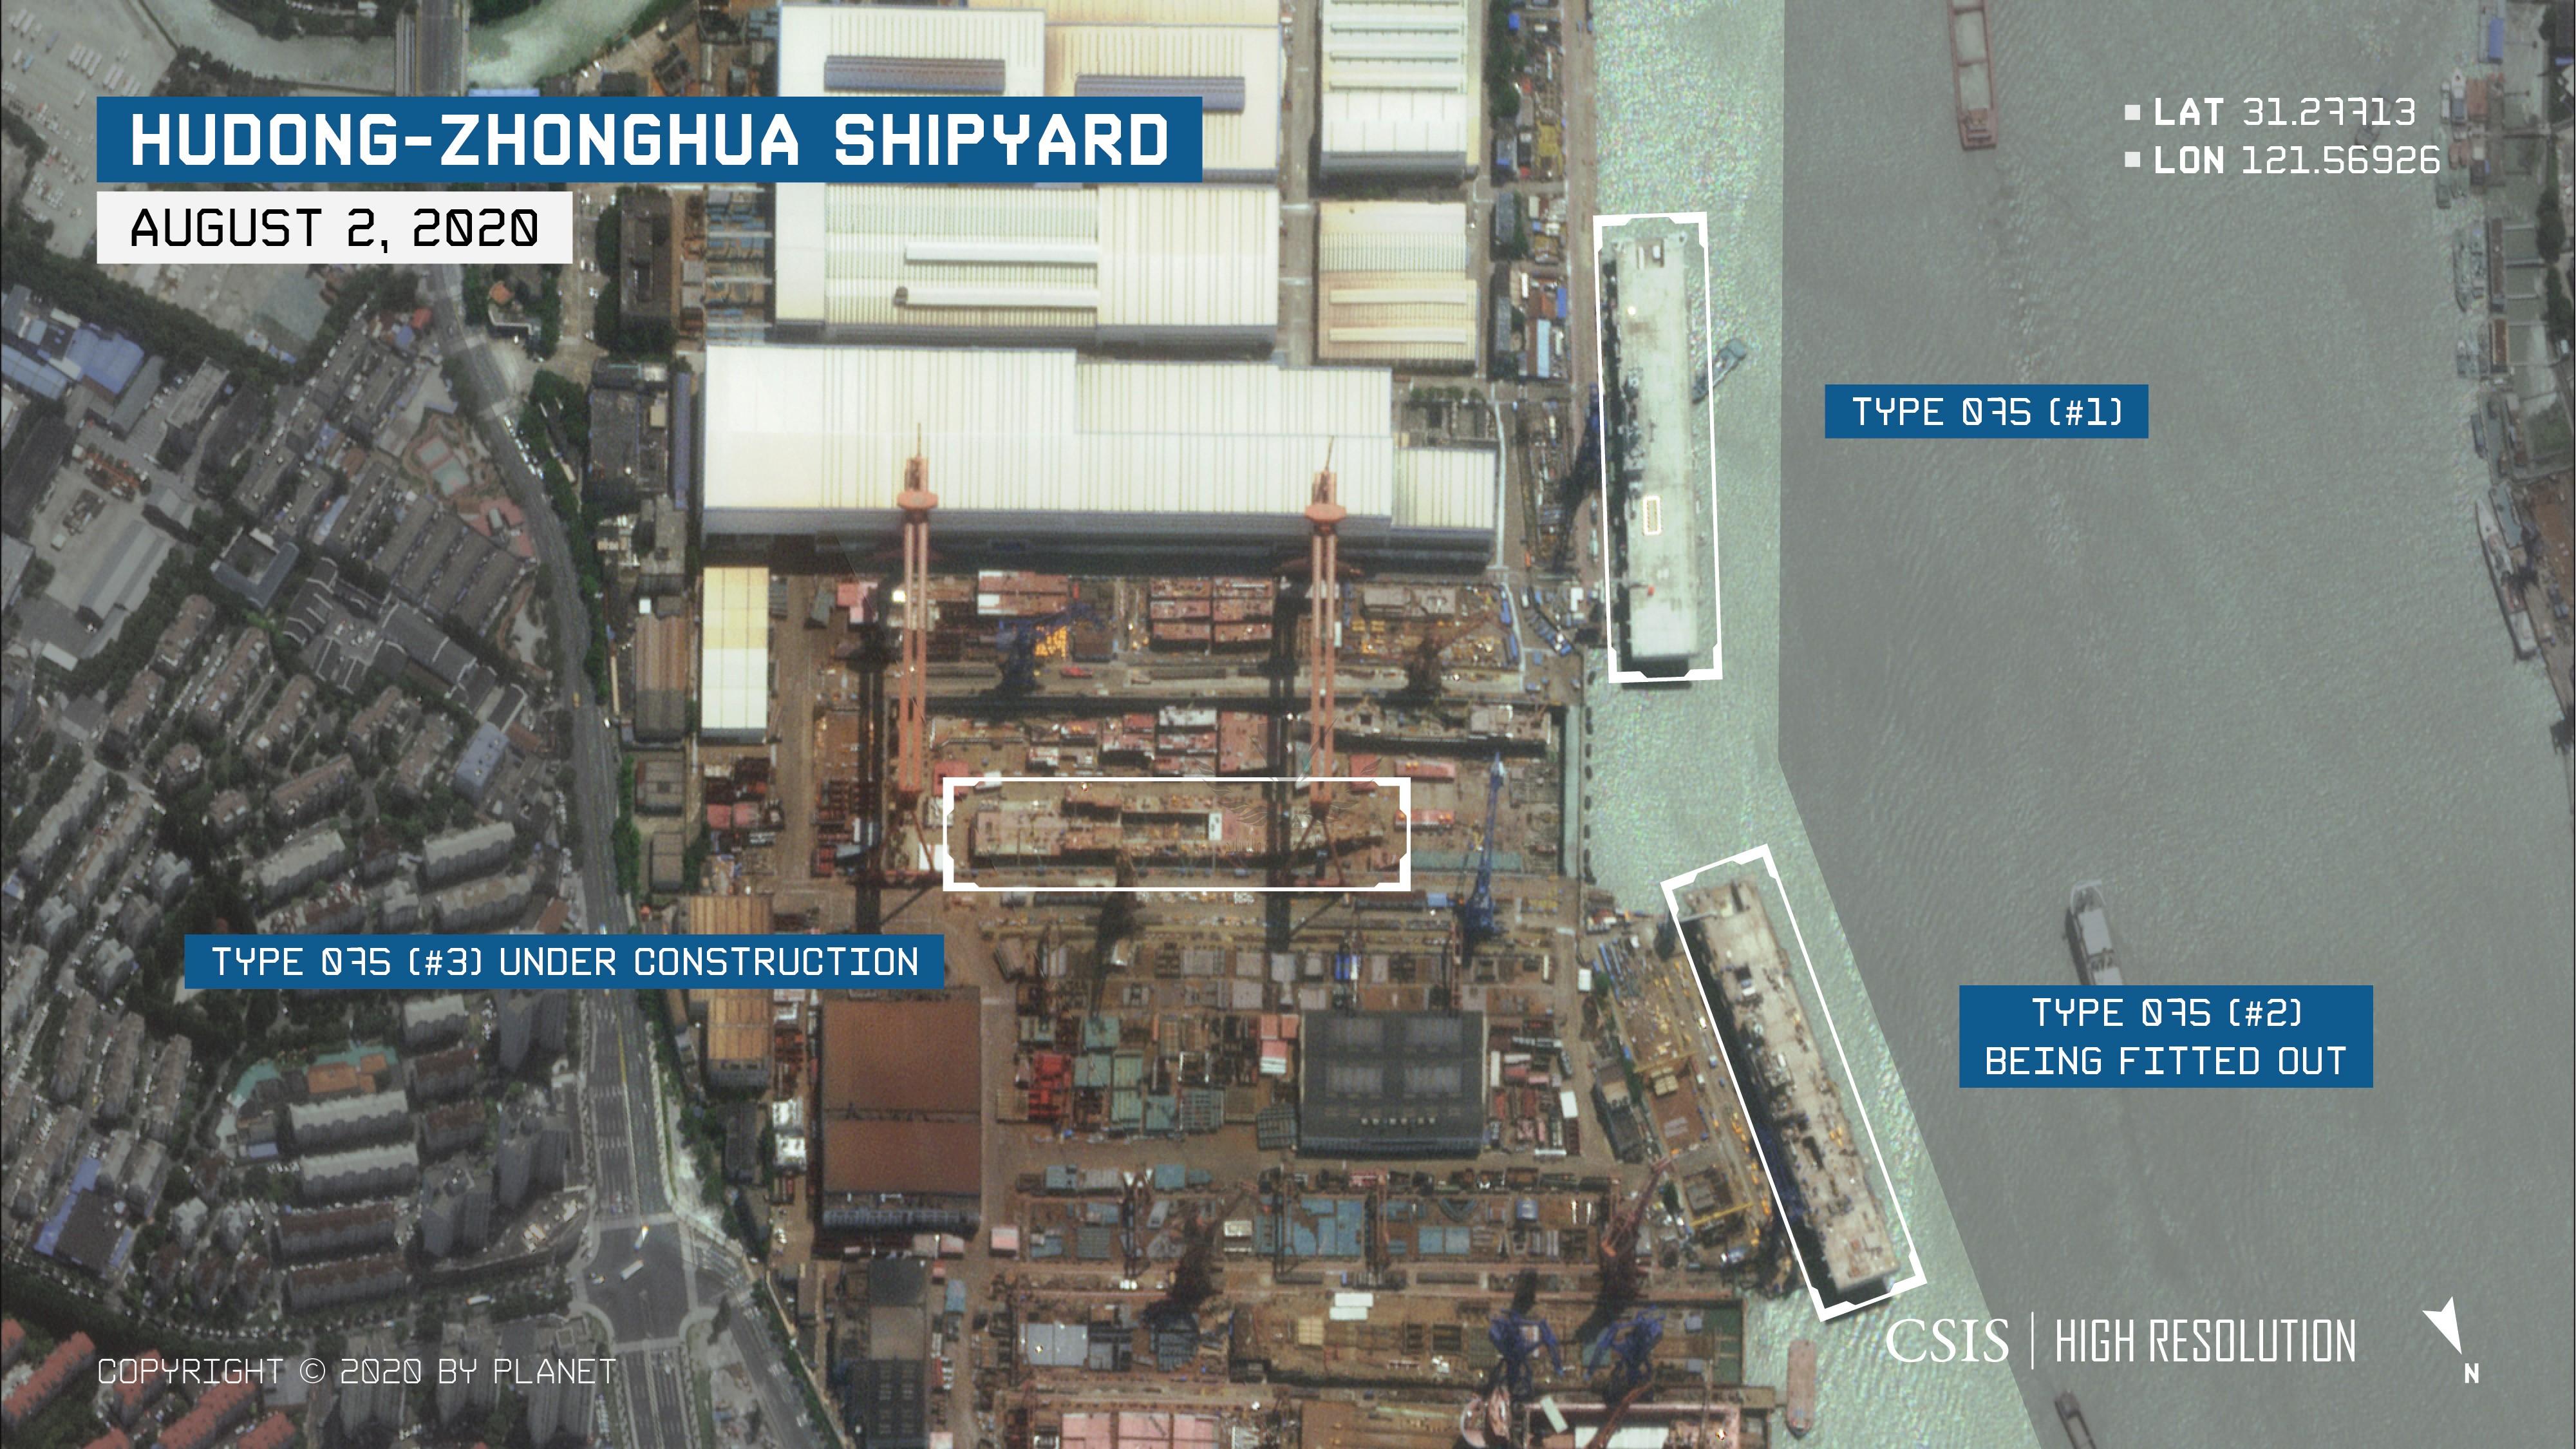 HighResSpotlight_Type095_Hudong-Zhongua_Shipyard.jpg